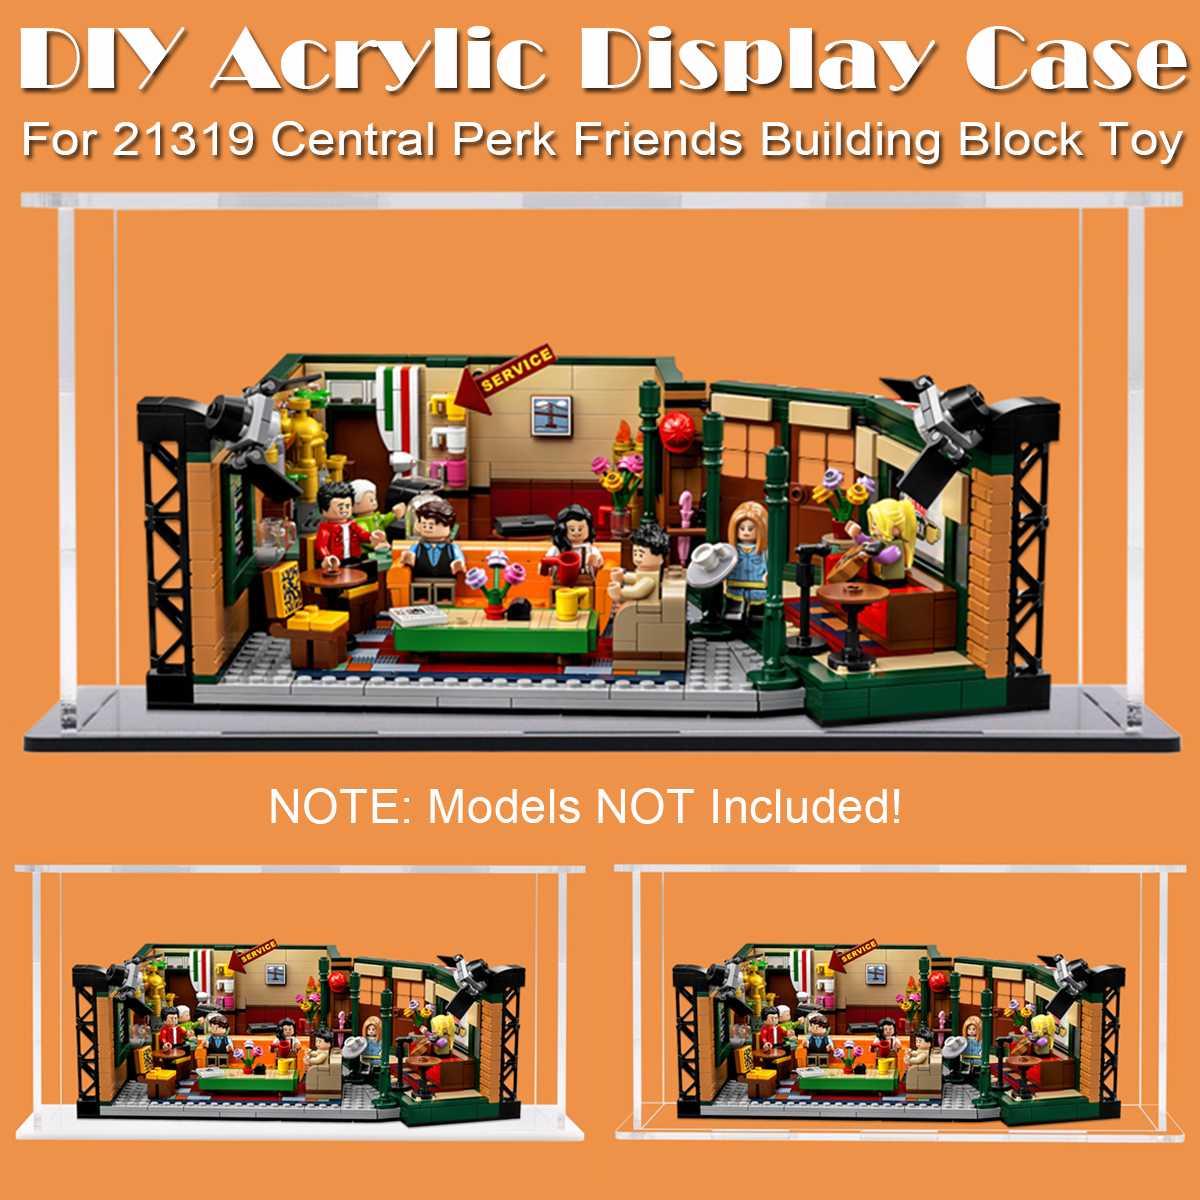 DIY Acrylic Display Case Self-Install Clear Cube Box Dustproof ShowCase Bricks Display Box For LEGO 21319 Central Perk Friends